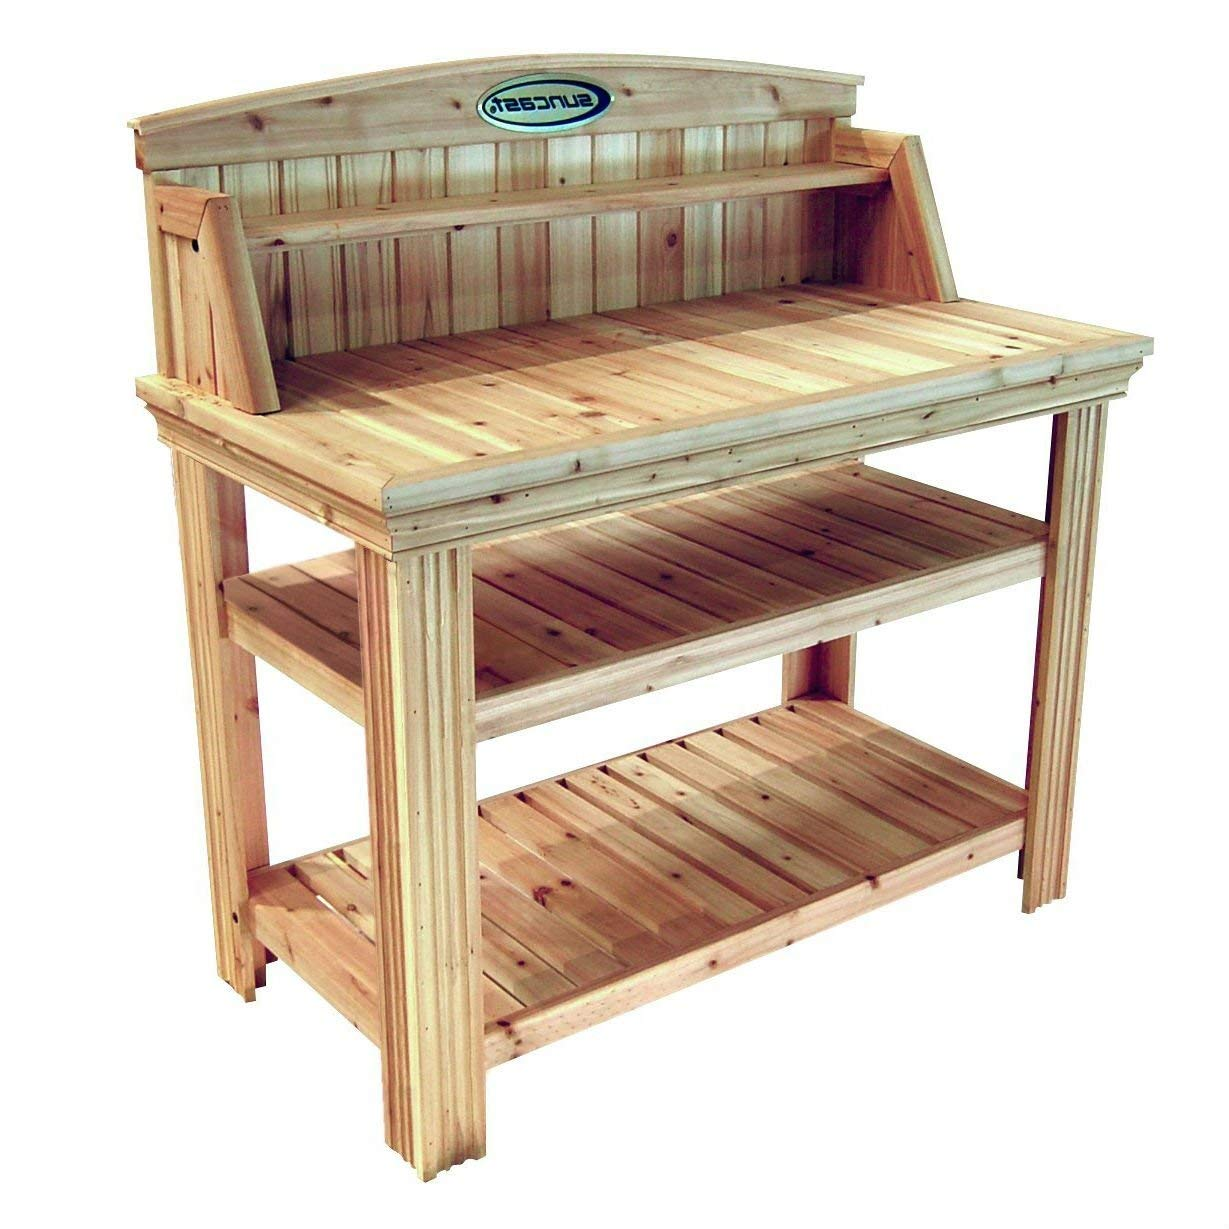 StarSun Depot Natural Cedar Wood Potting Bench Garden Work Table with Shelves